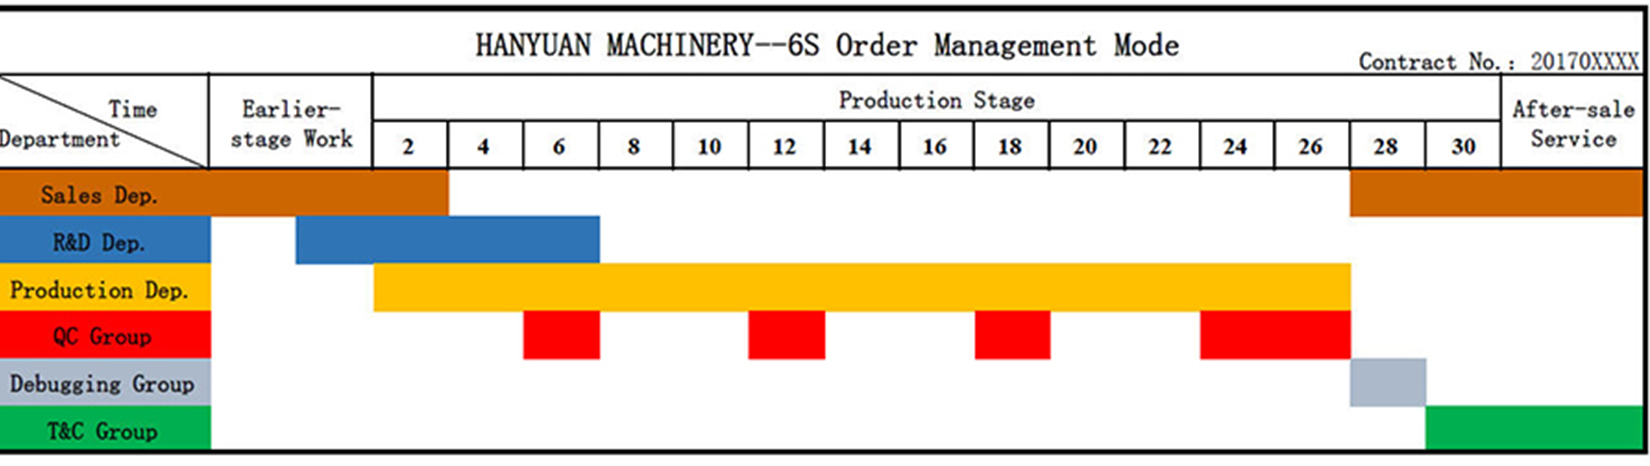 6s Order Management Mode-HANYUAN MACHINERY